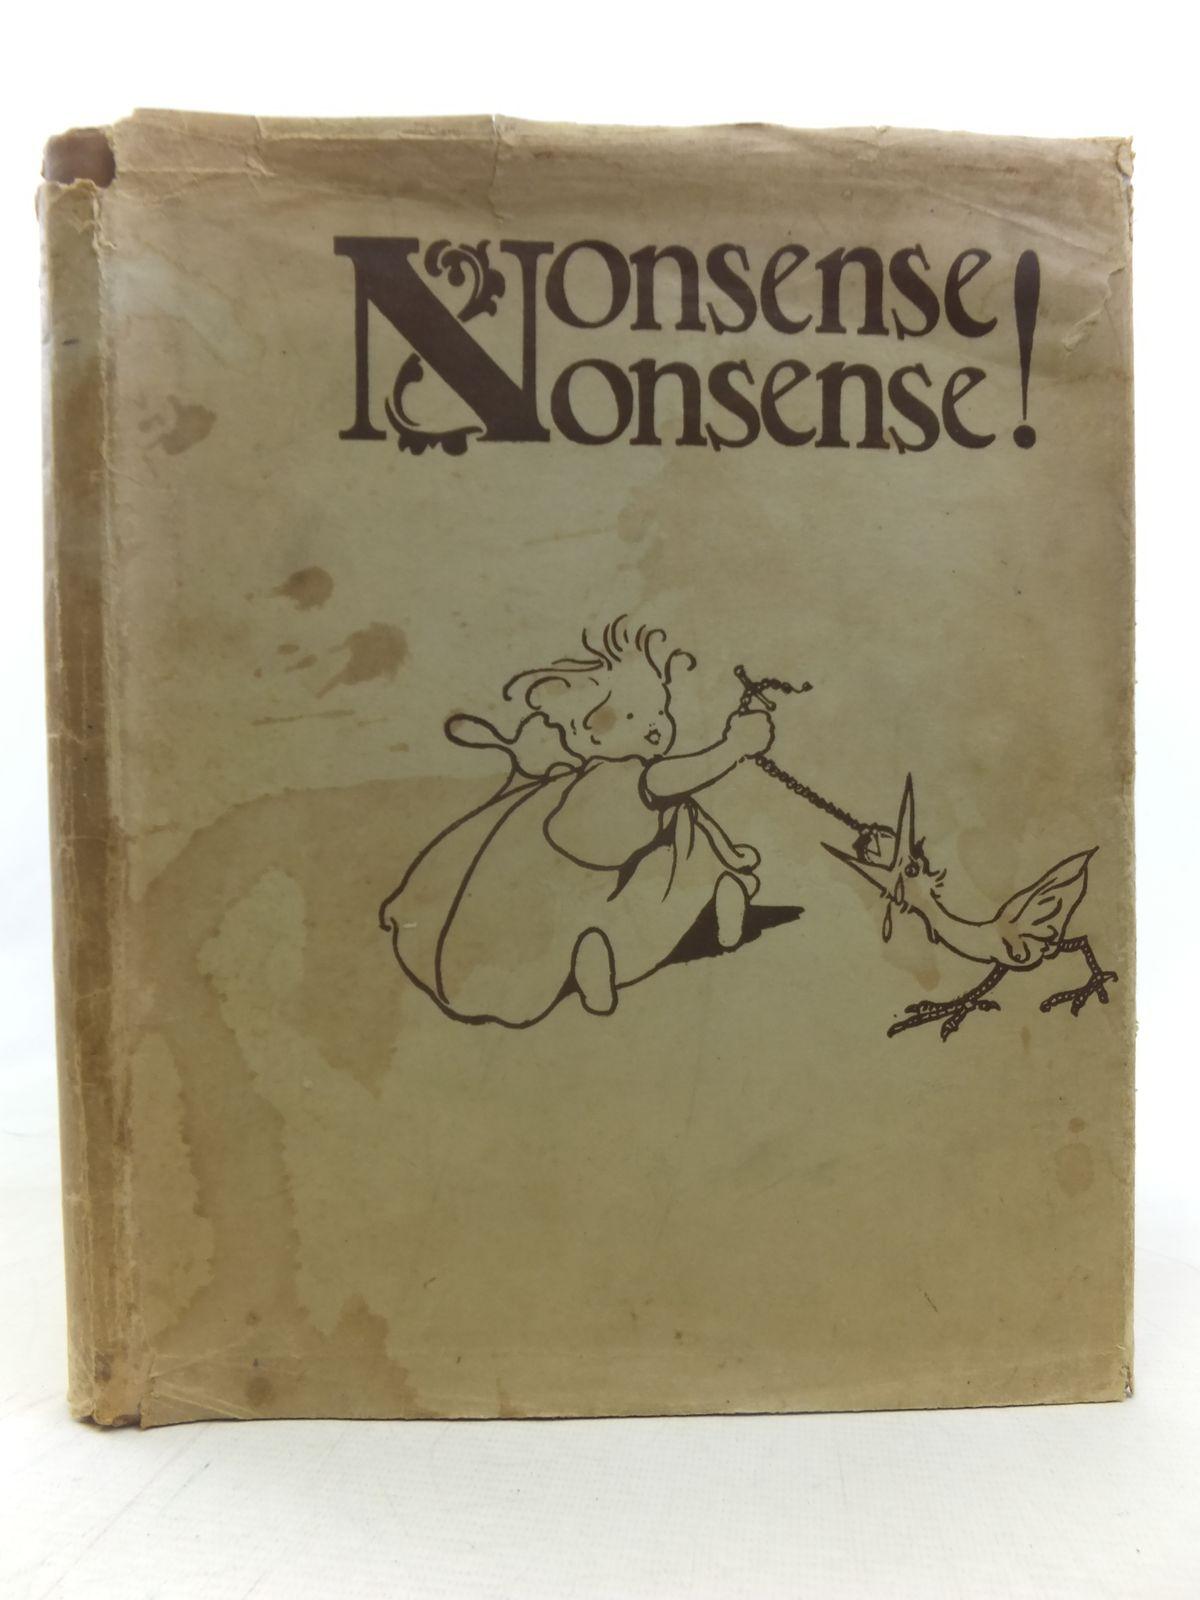 Nonsense Nonsense!